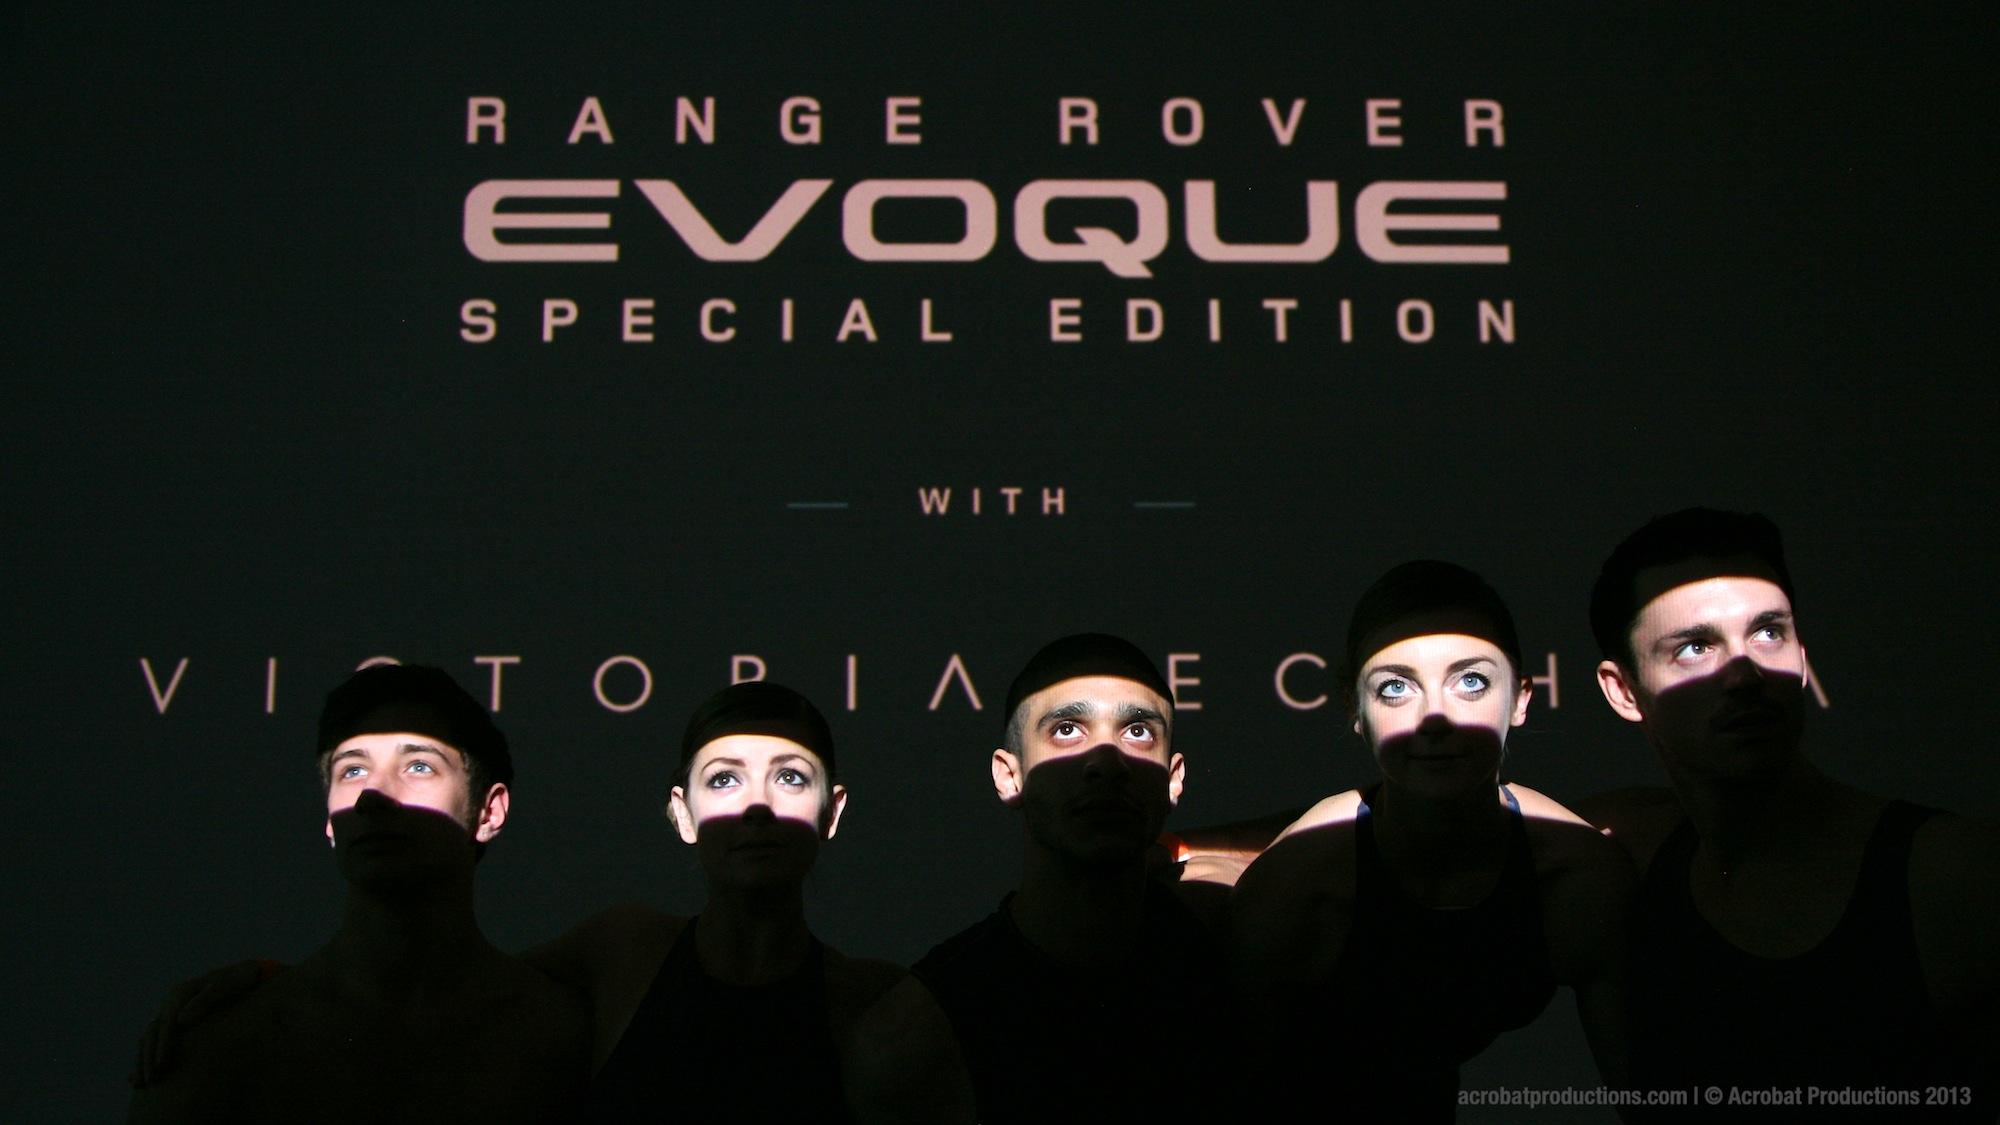 Range Rover Evoque Beijing with Victoria Beckham